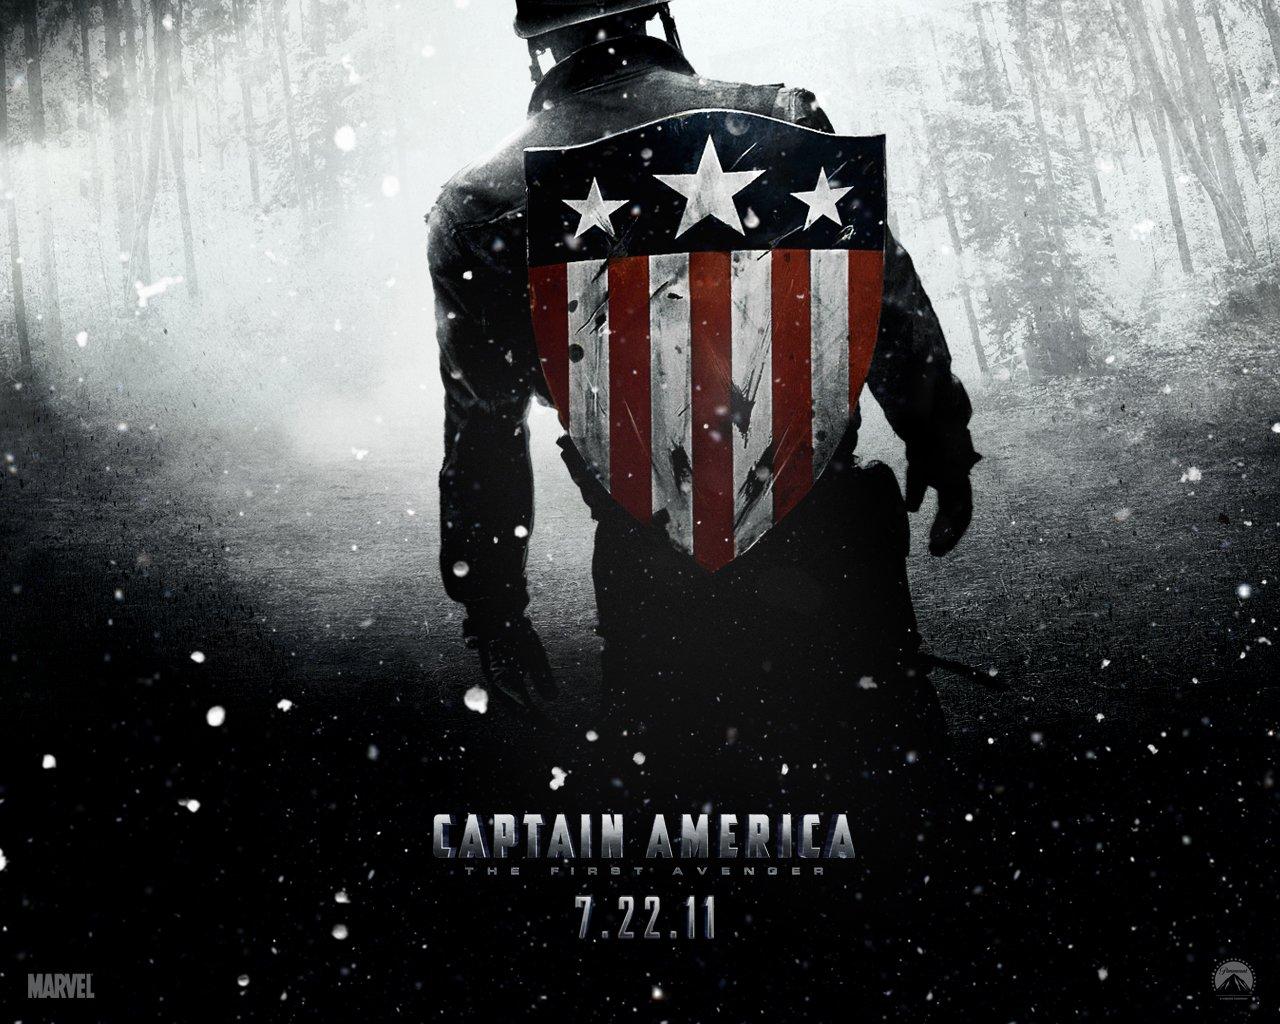 New Captain America Movie Stills and Wallpapers   Nerd Reactor 1280x1024